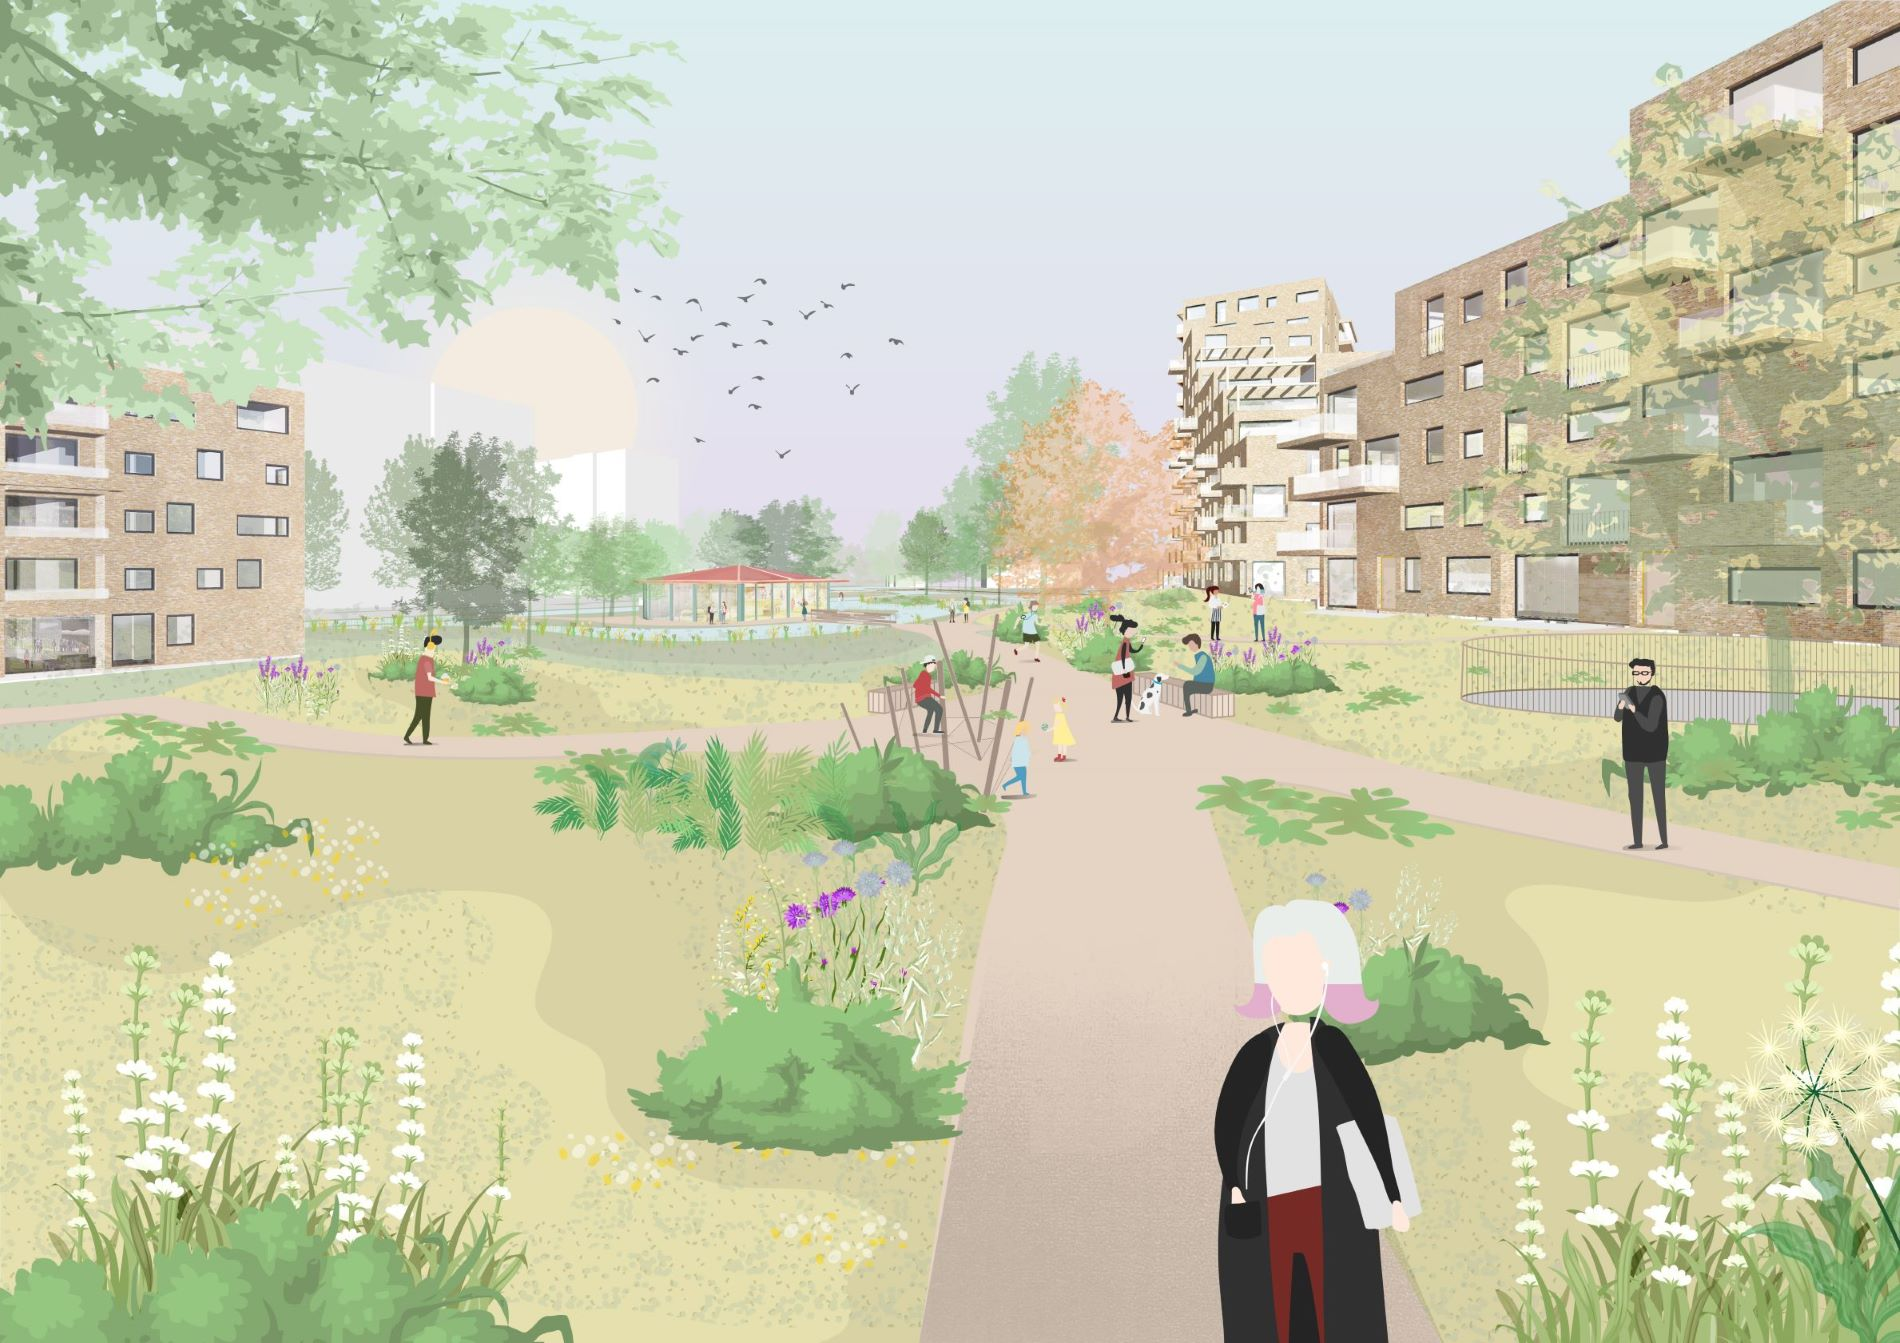 inzending Blinkert Capelle_2020 with landscape view1-01